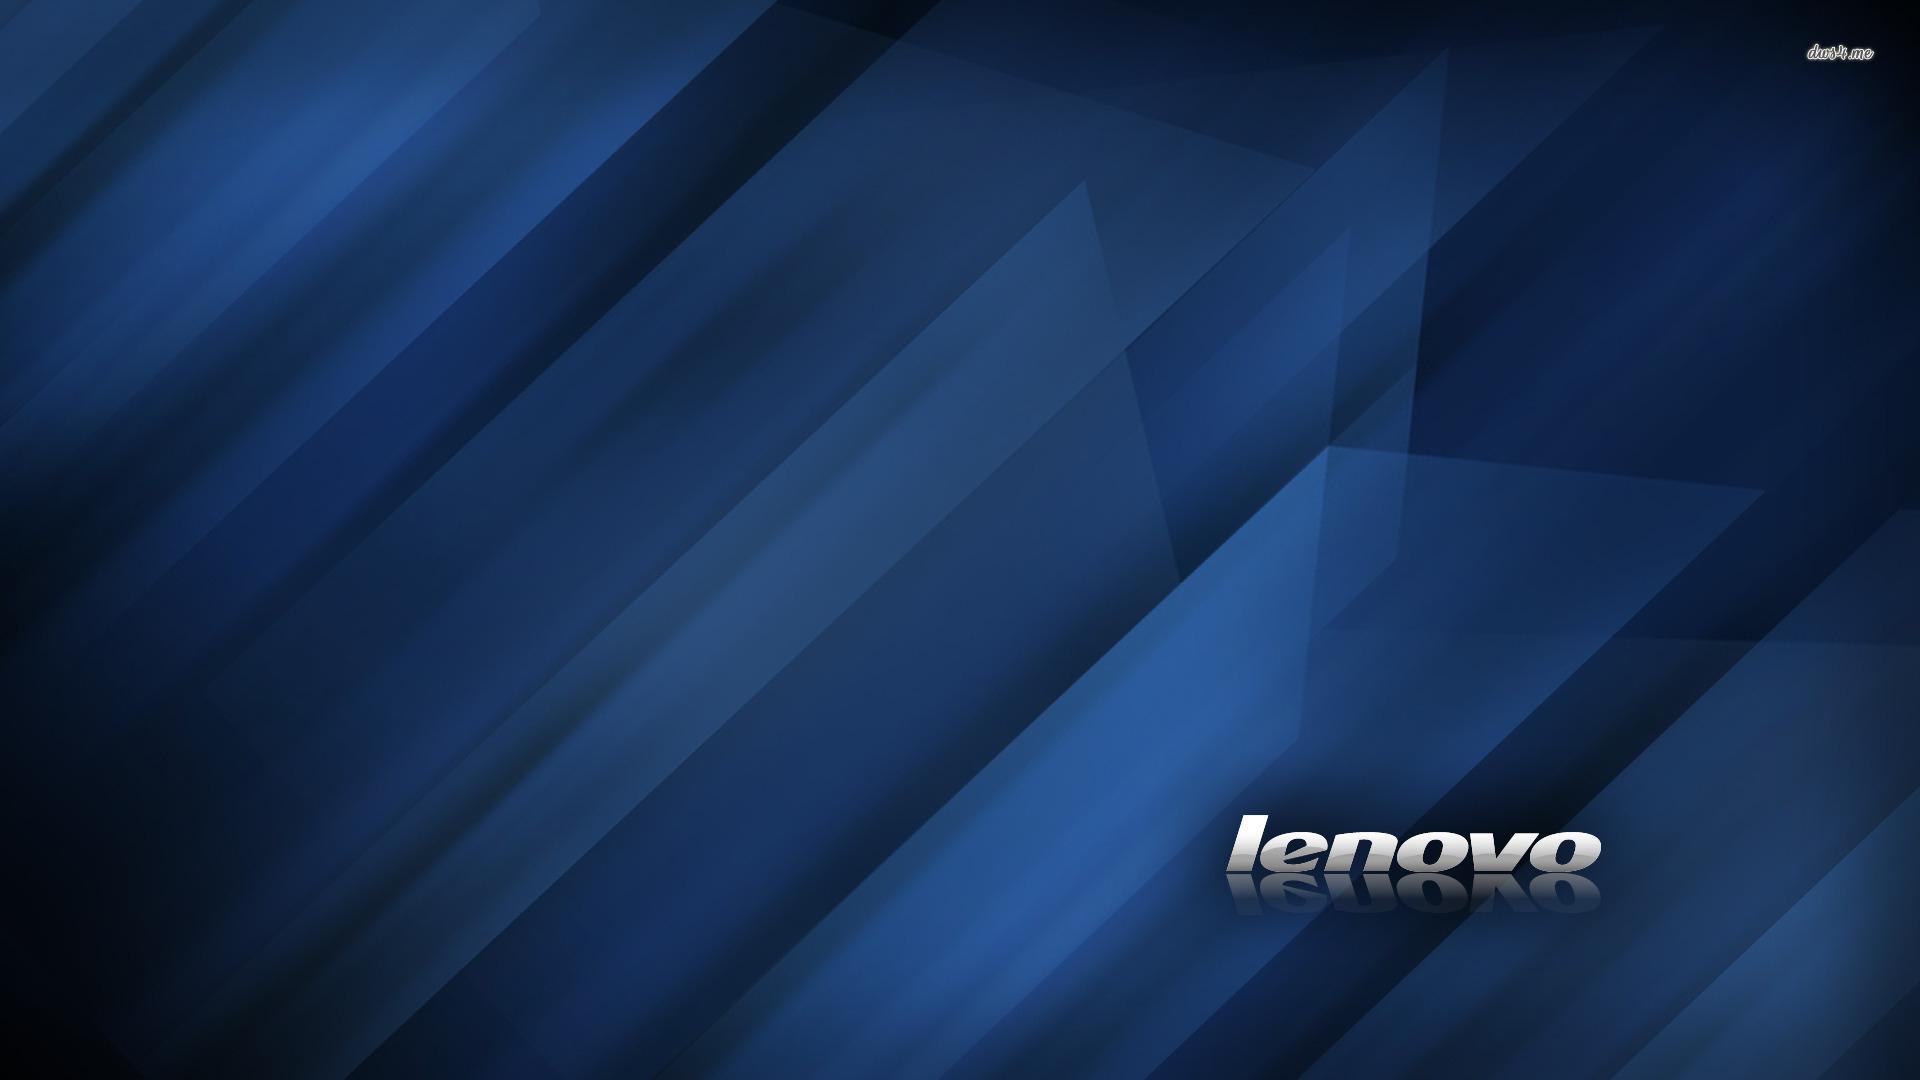 lenovo wallpapers hd windows wallpapers - HD1920×1080